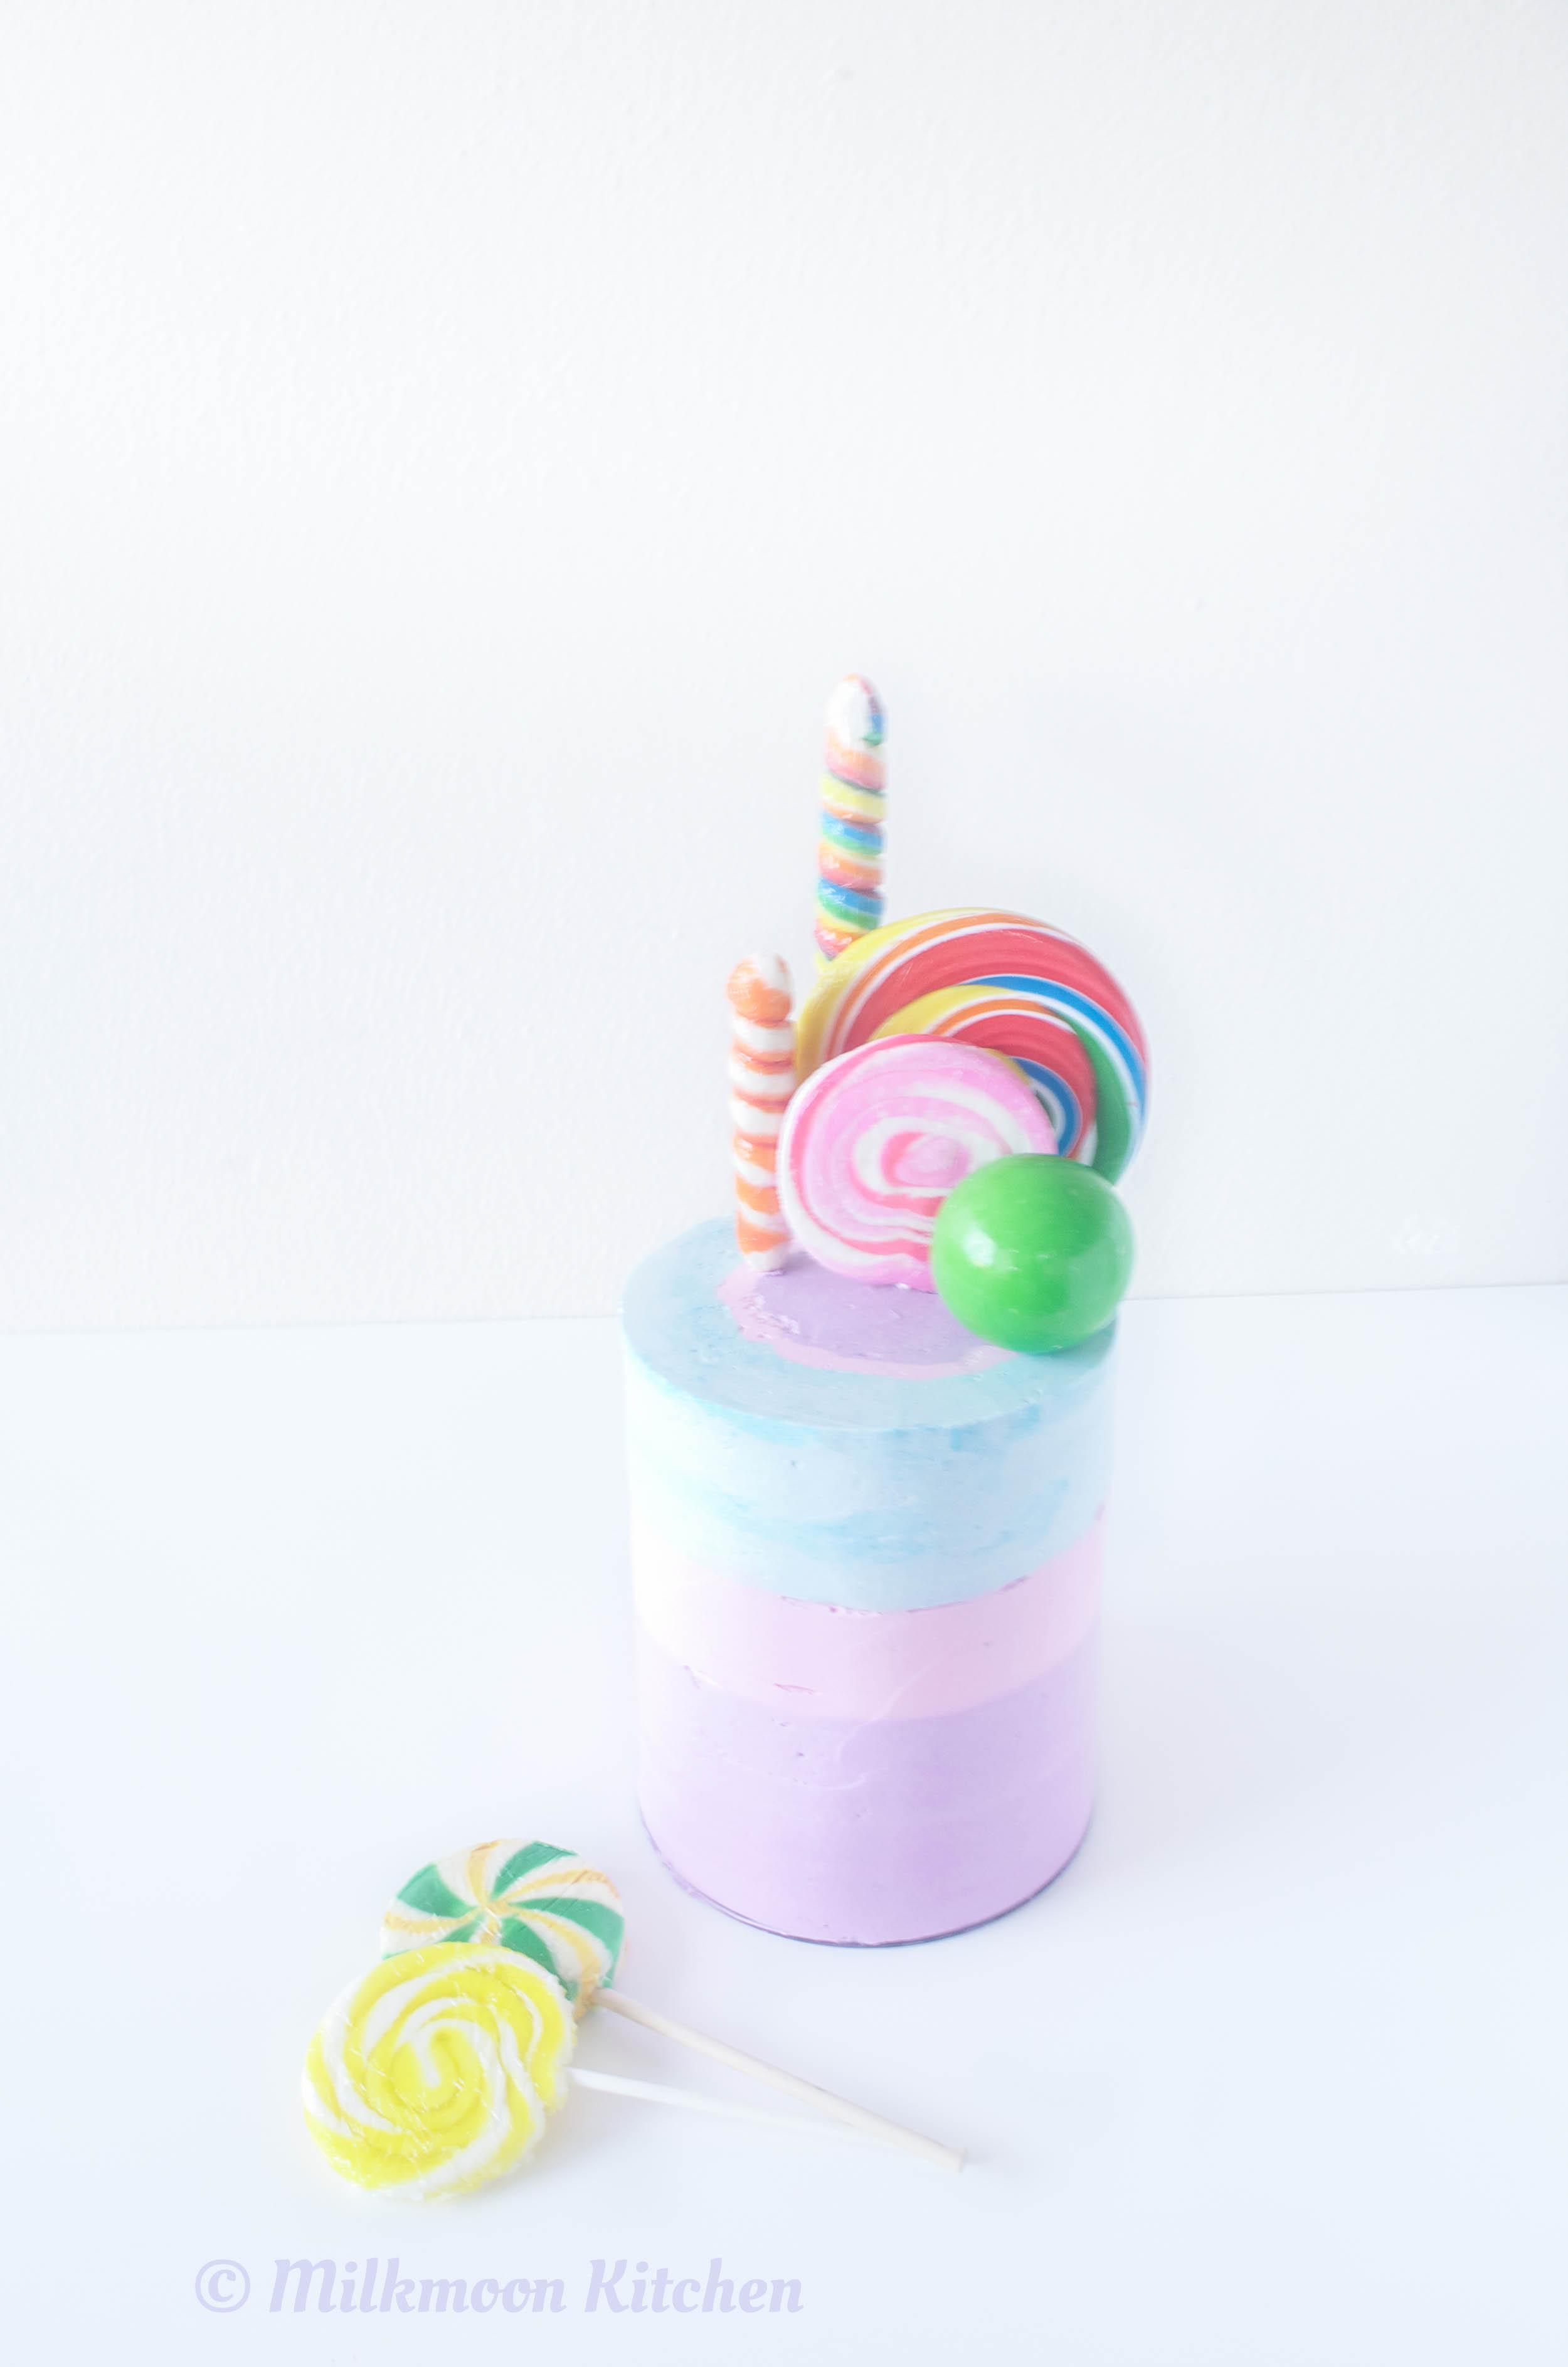 Candy Cake Edited (1 of 7).jpg